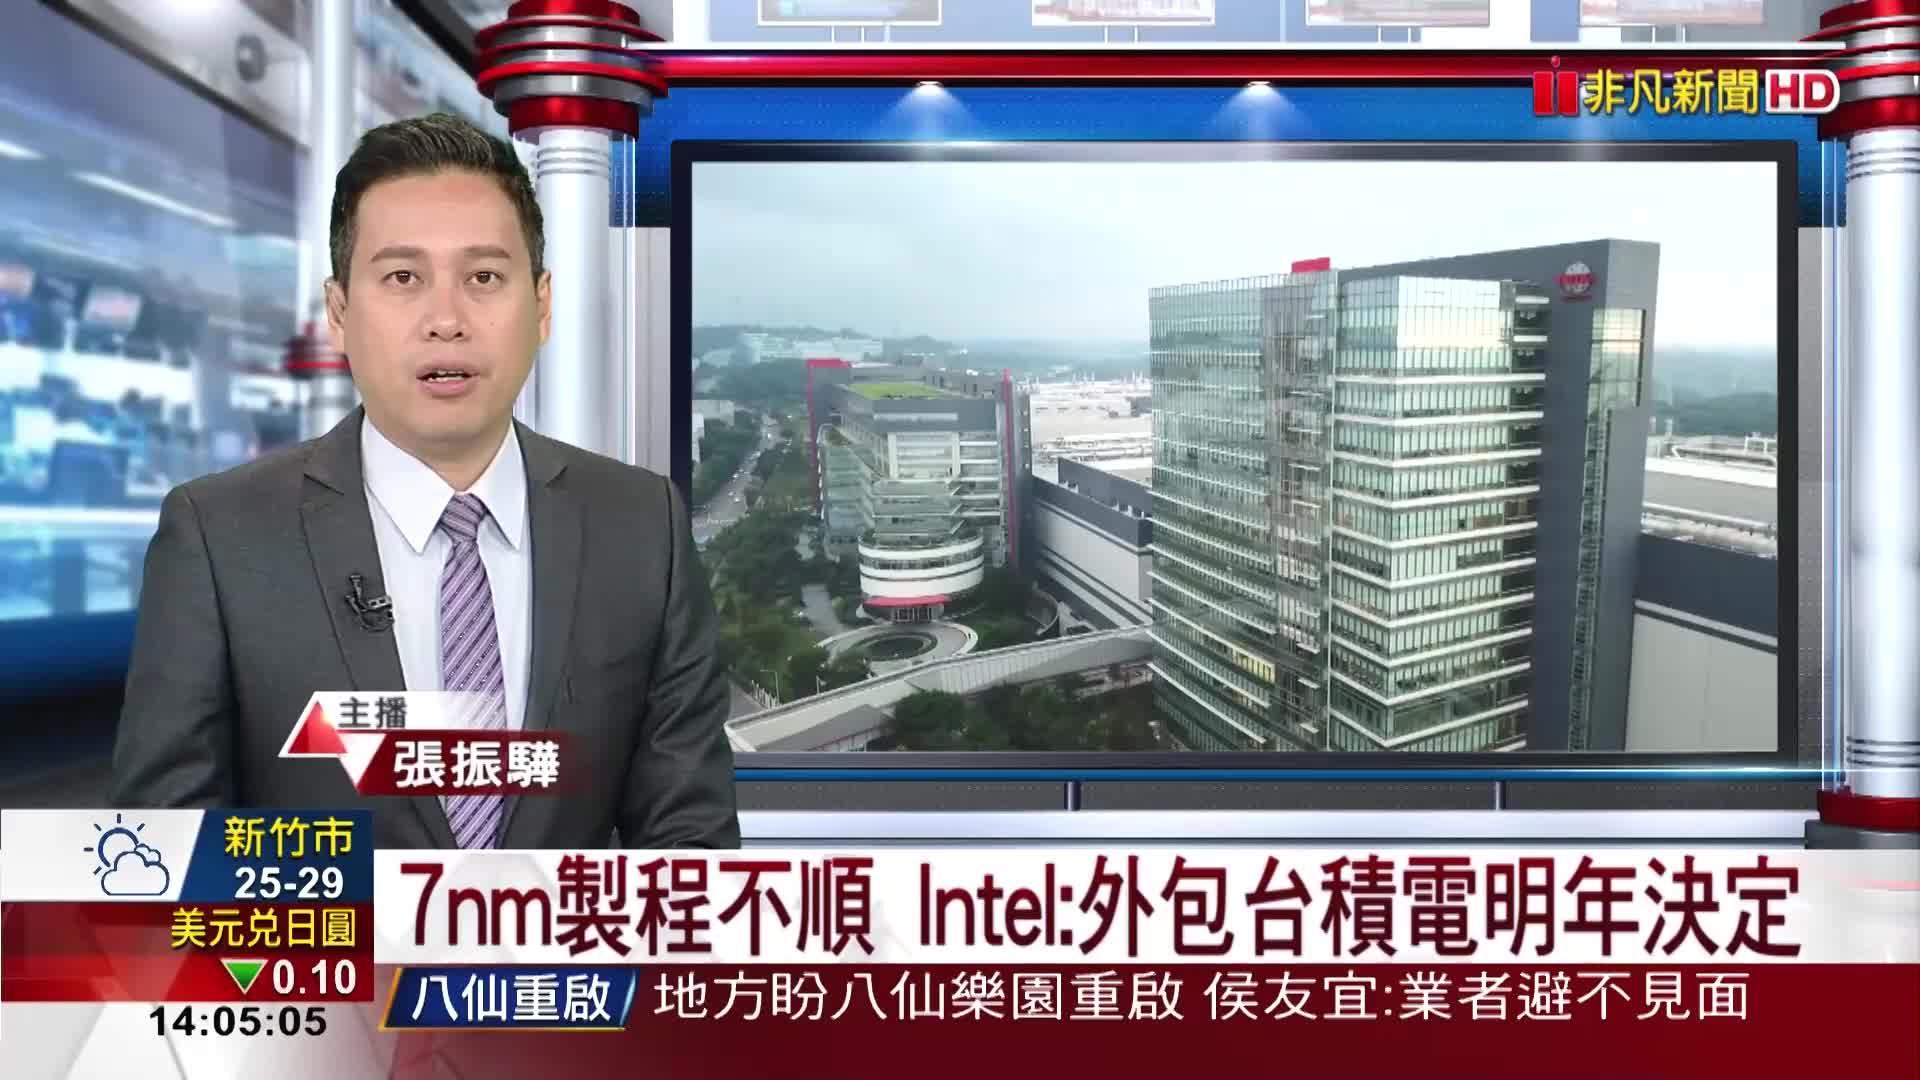 7nm製程不順 Intel:外包台積電明年決定